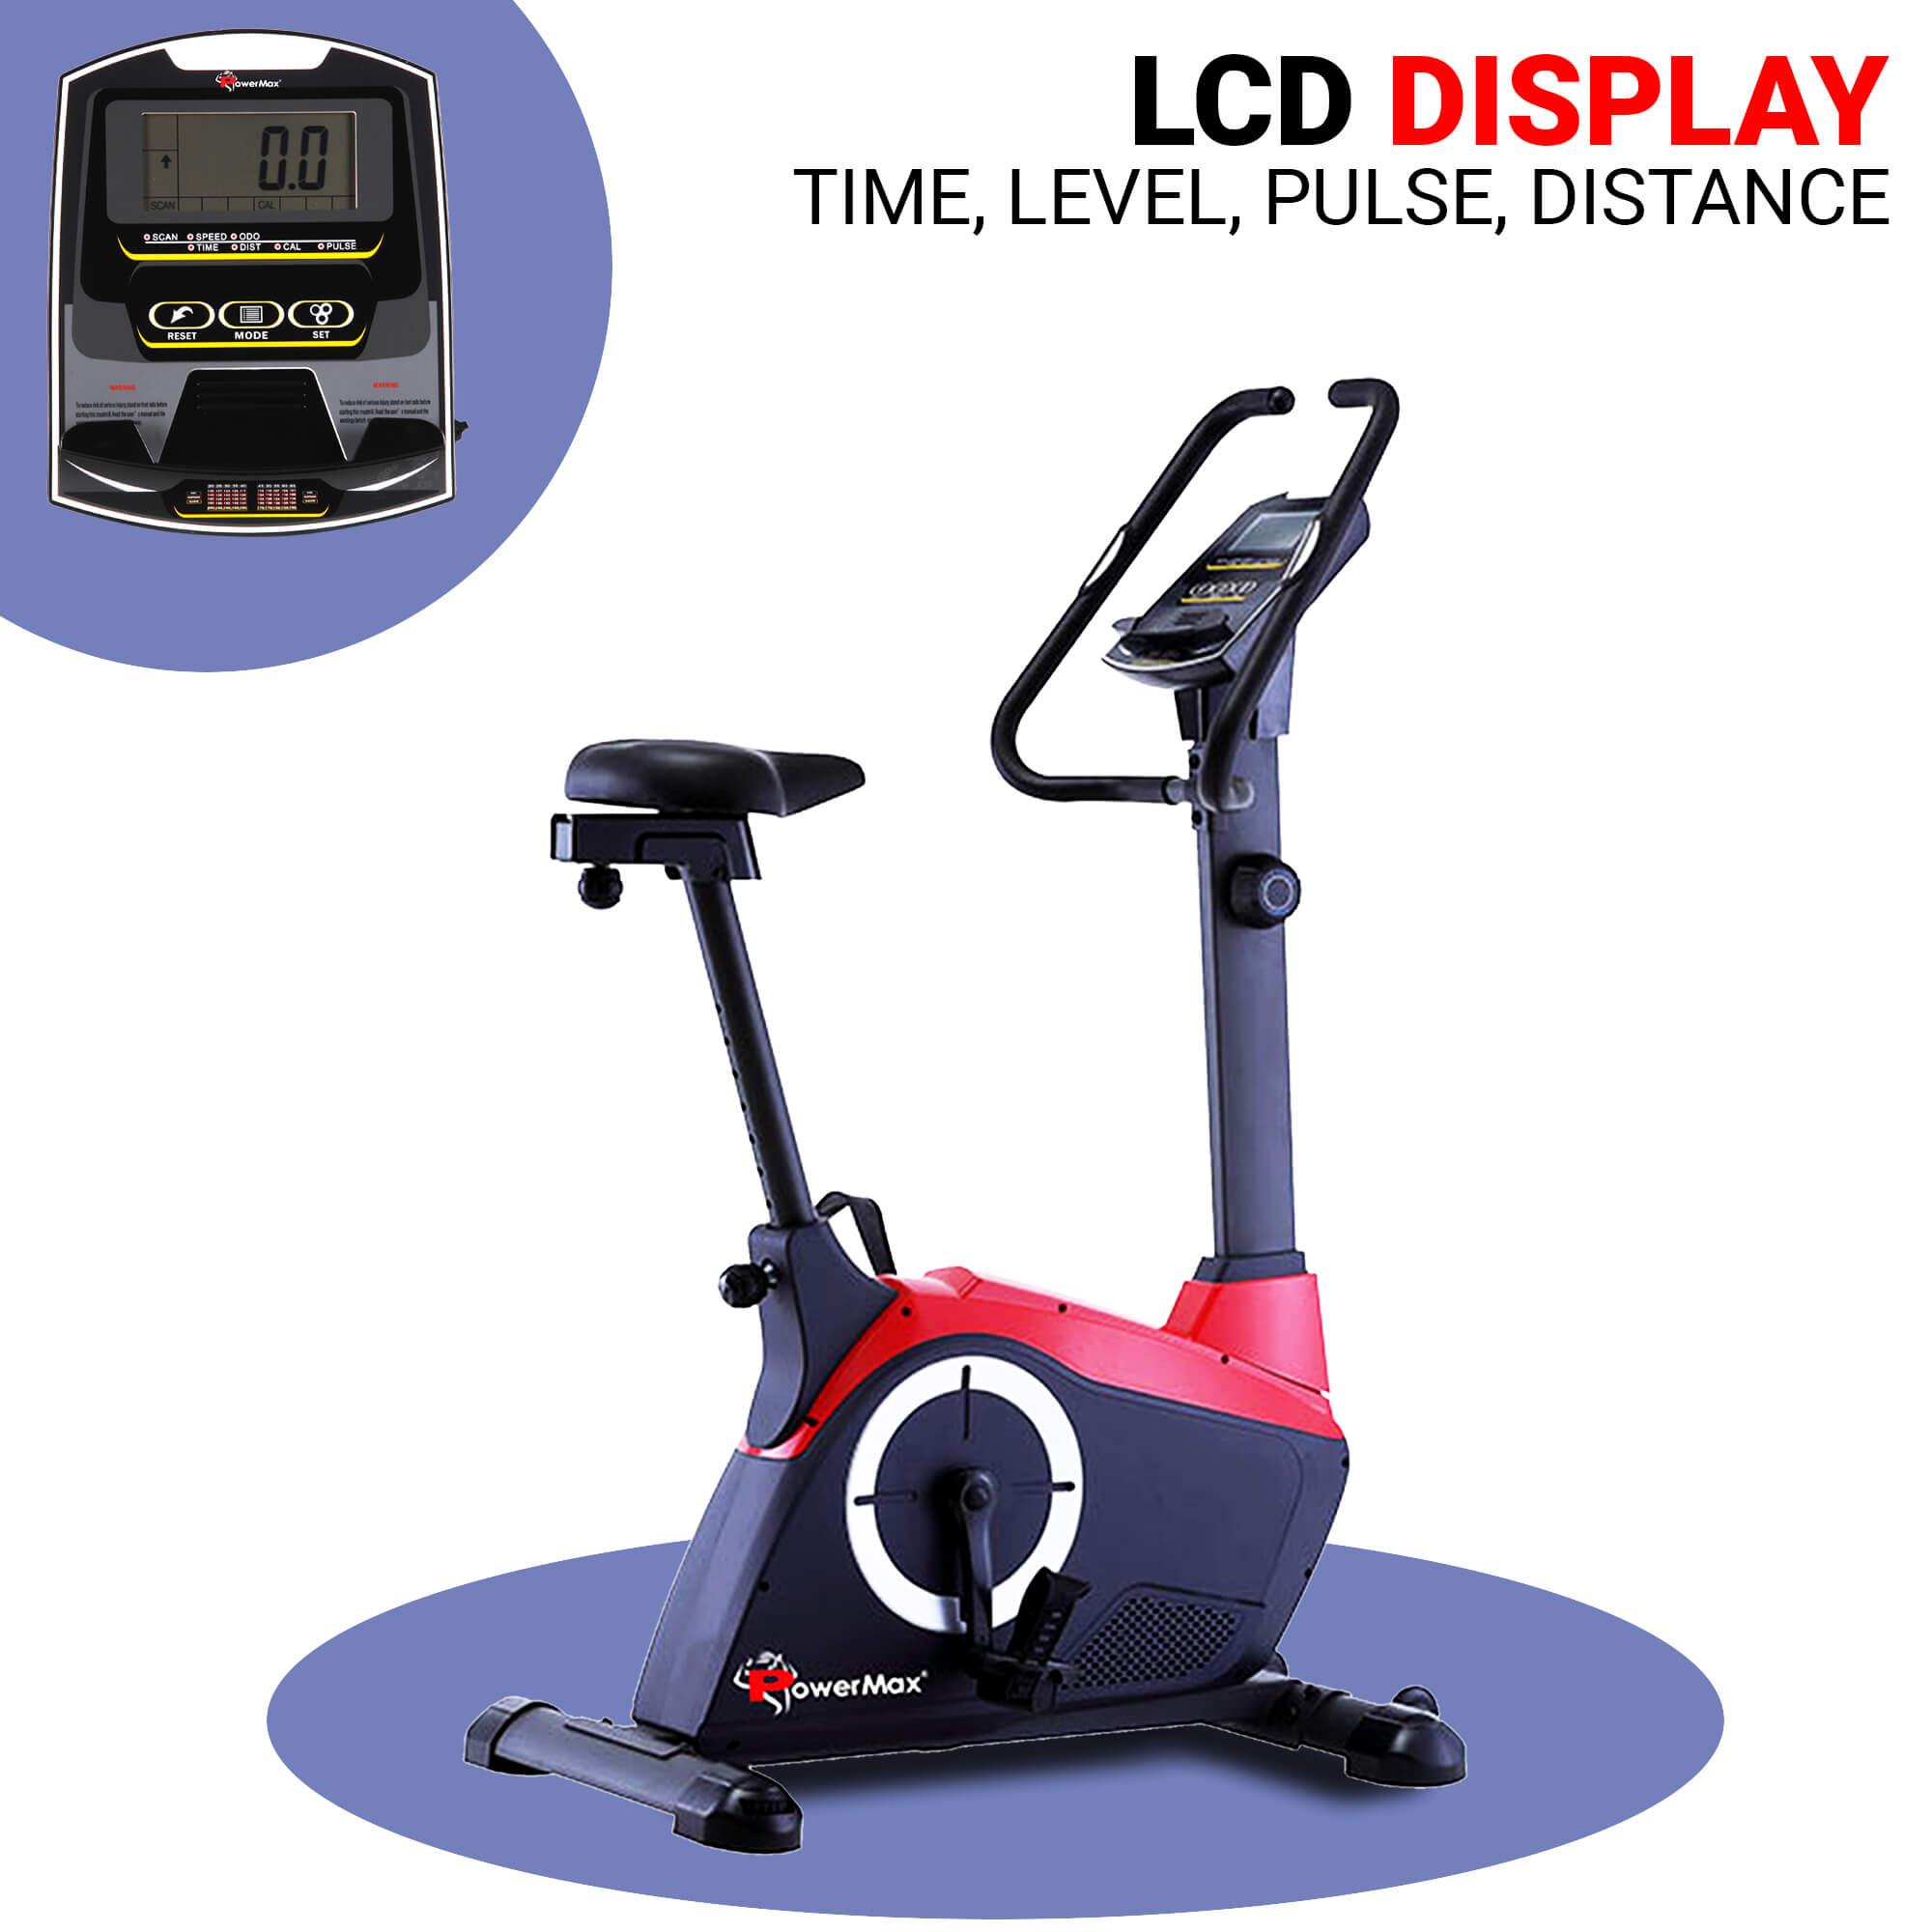 BU-800 Magnetic Upright Bike